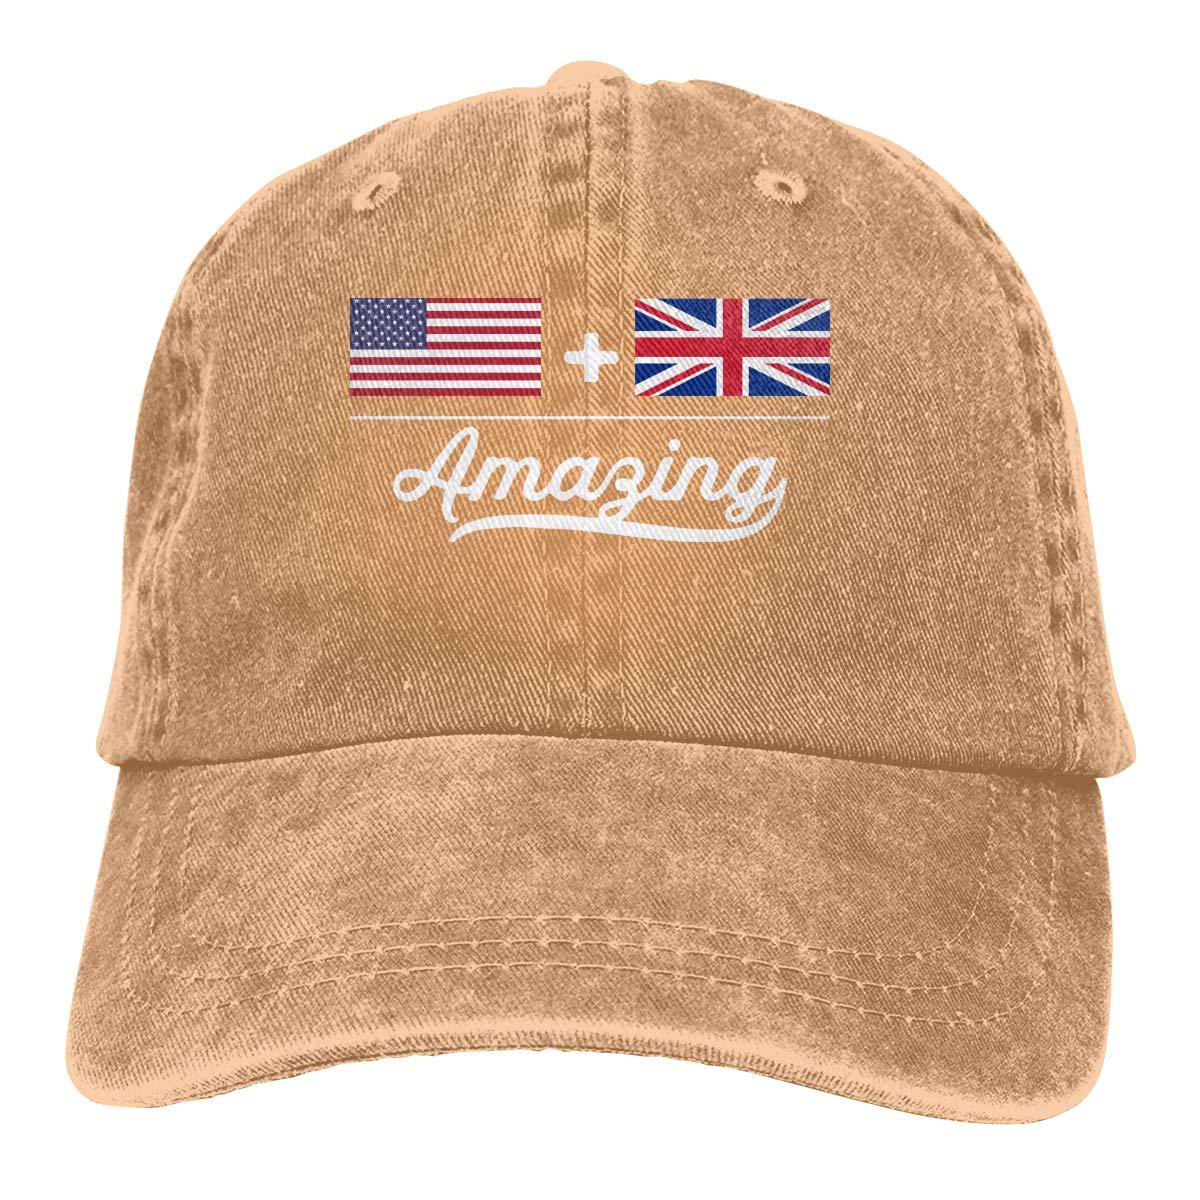 British = Amazing Flag Unisex Adult Cowboy Hat Sun Hat Adjustable Truck Driver Hat American